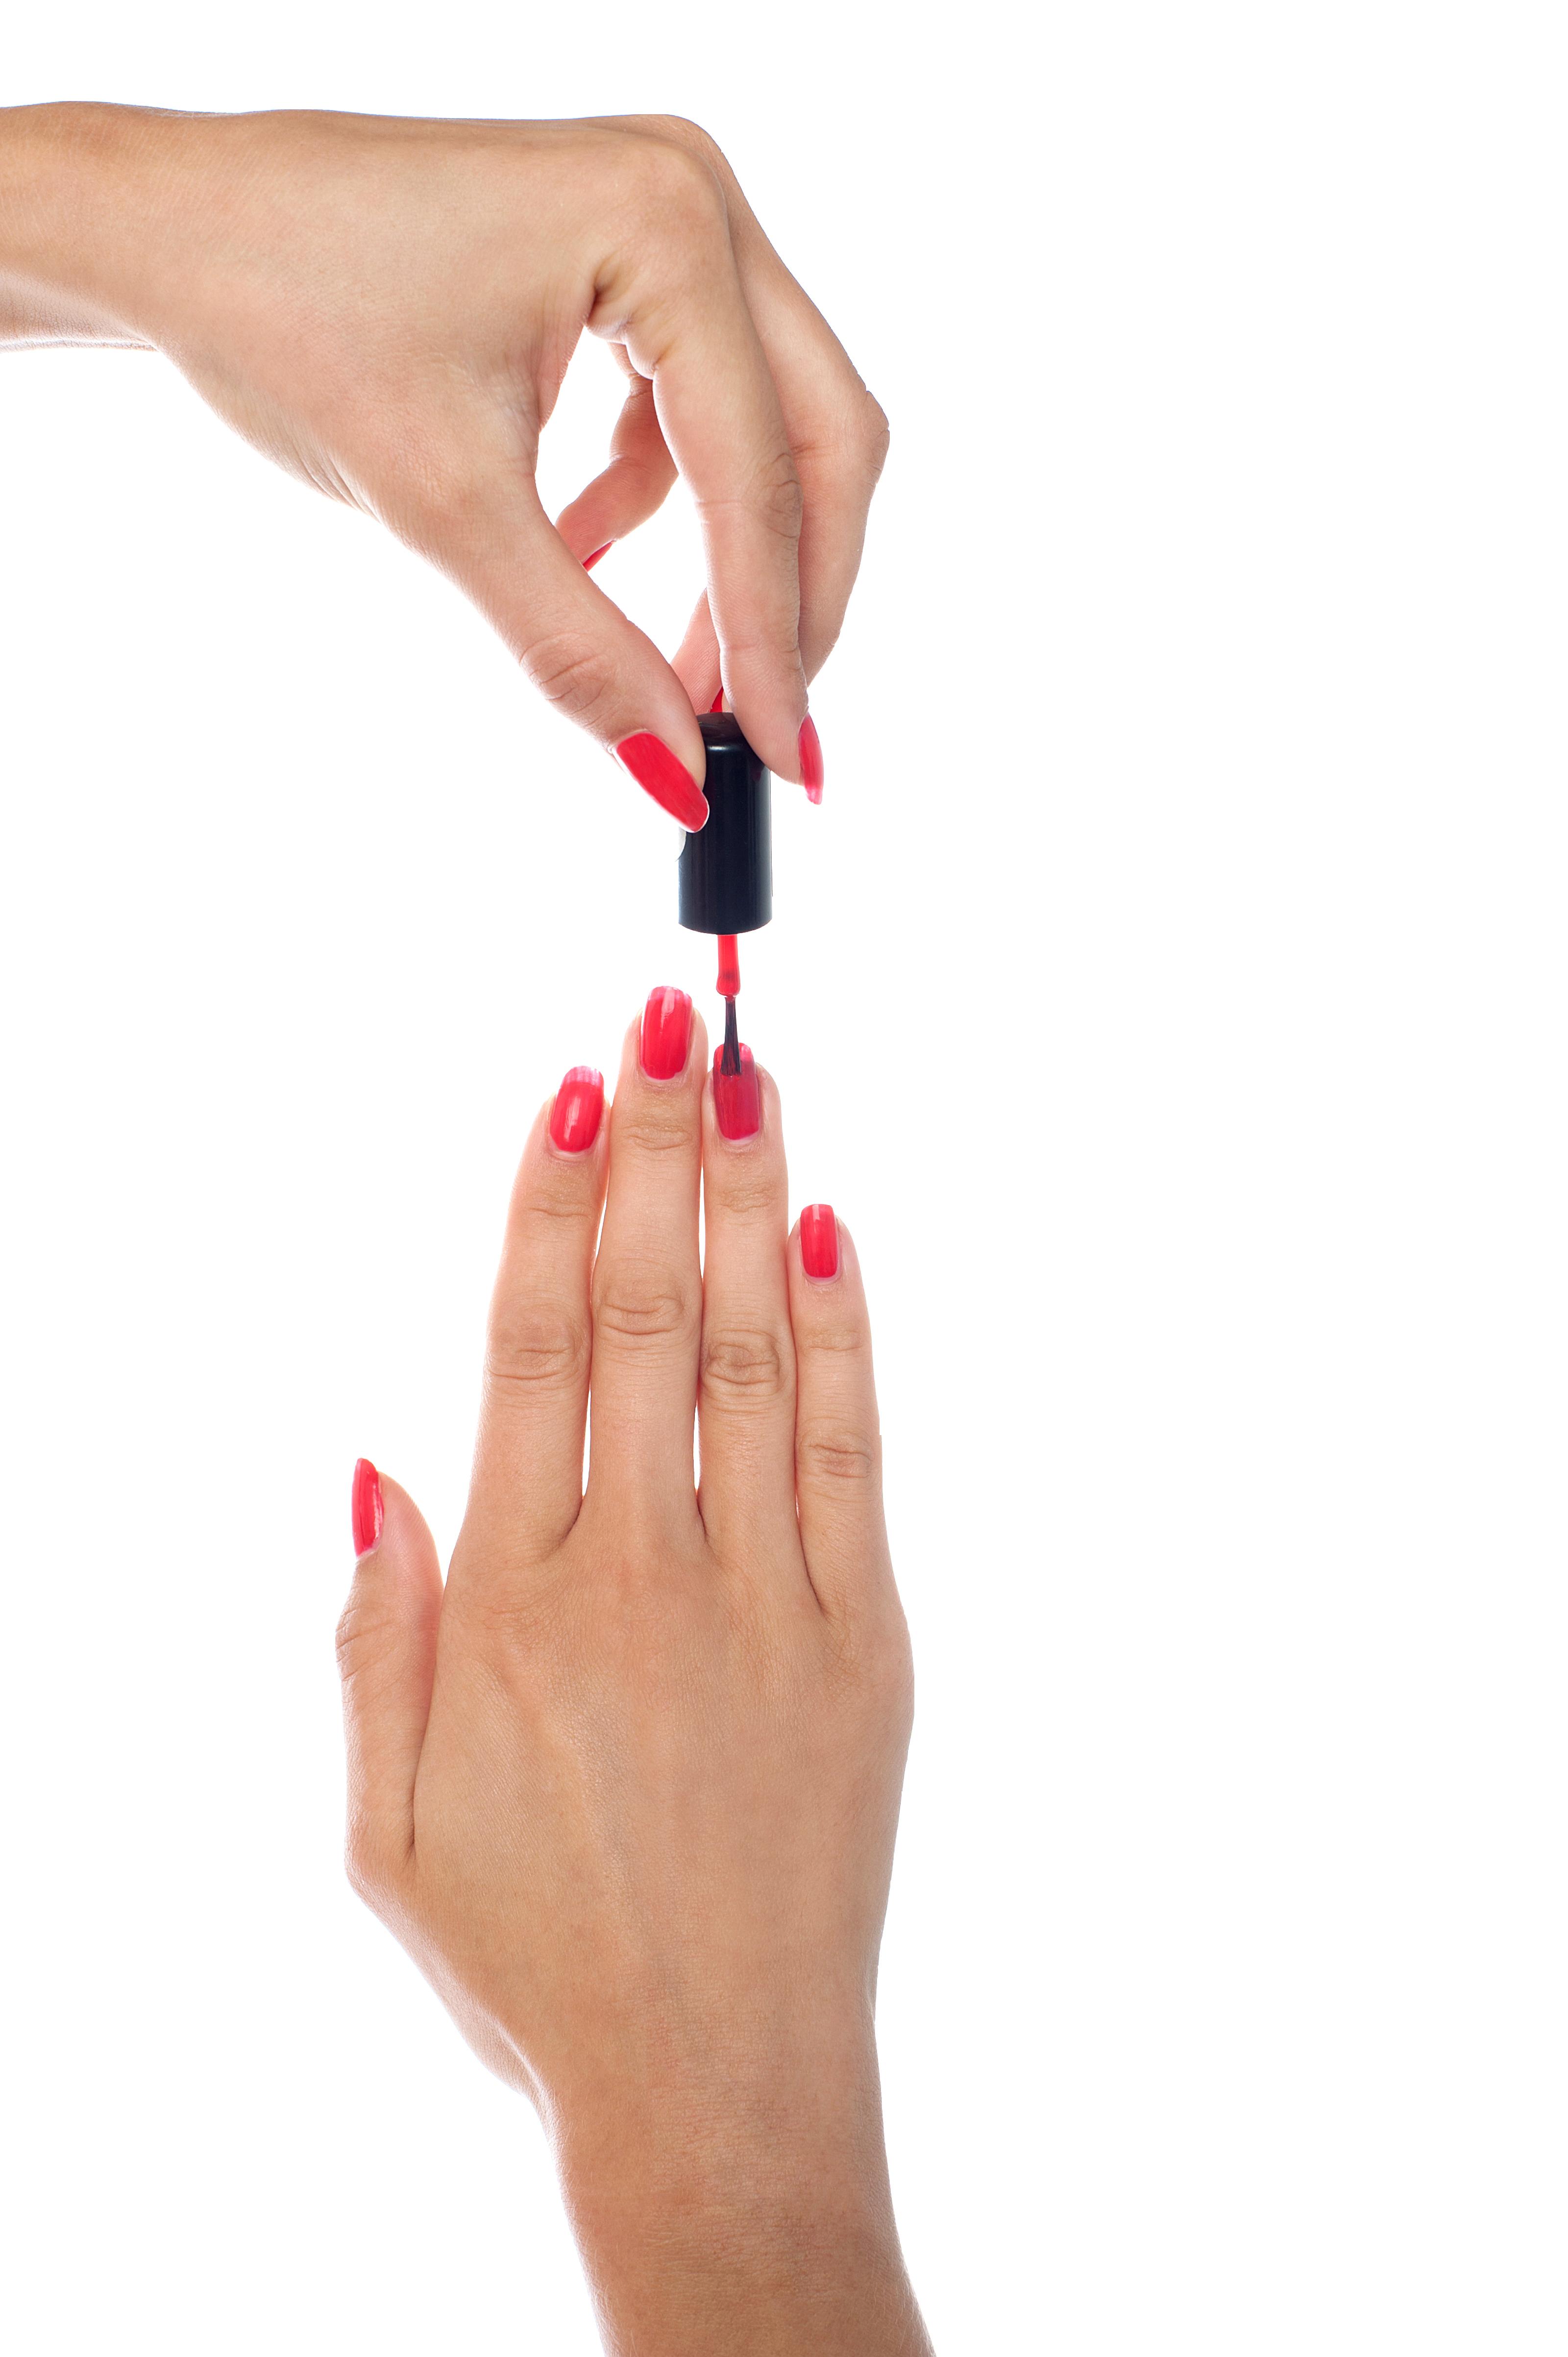 Finger Nail Paint PNG Image